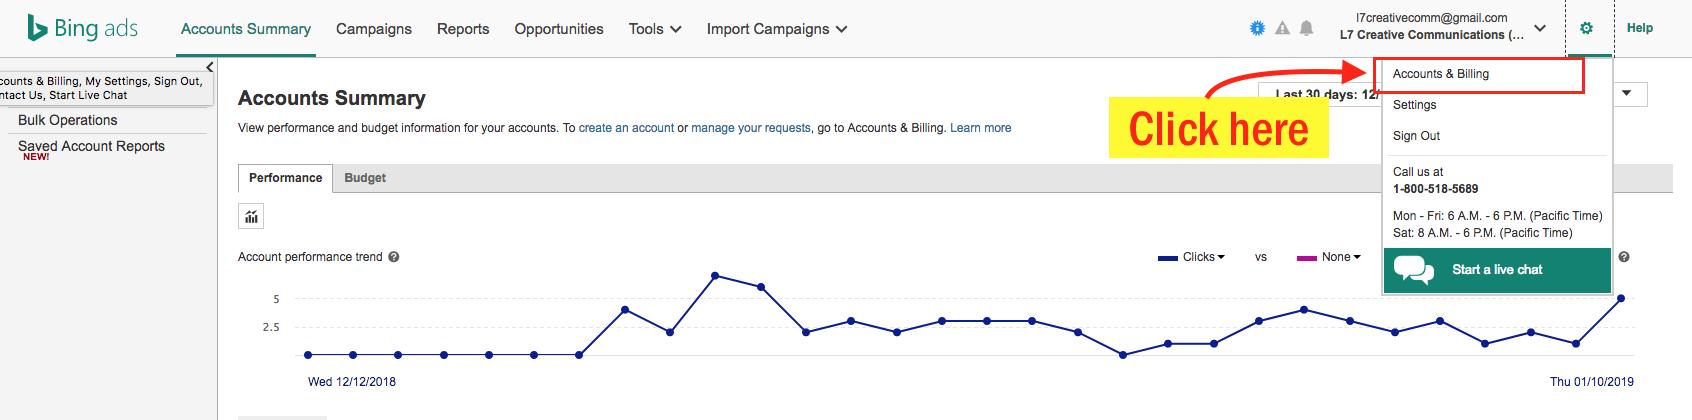 Edit Your Bing Ads Payment Info - Step 3 Screenshot